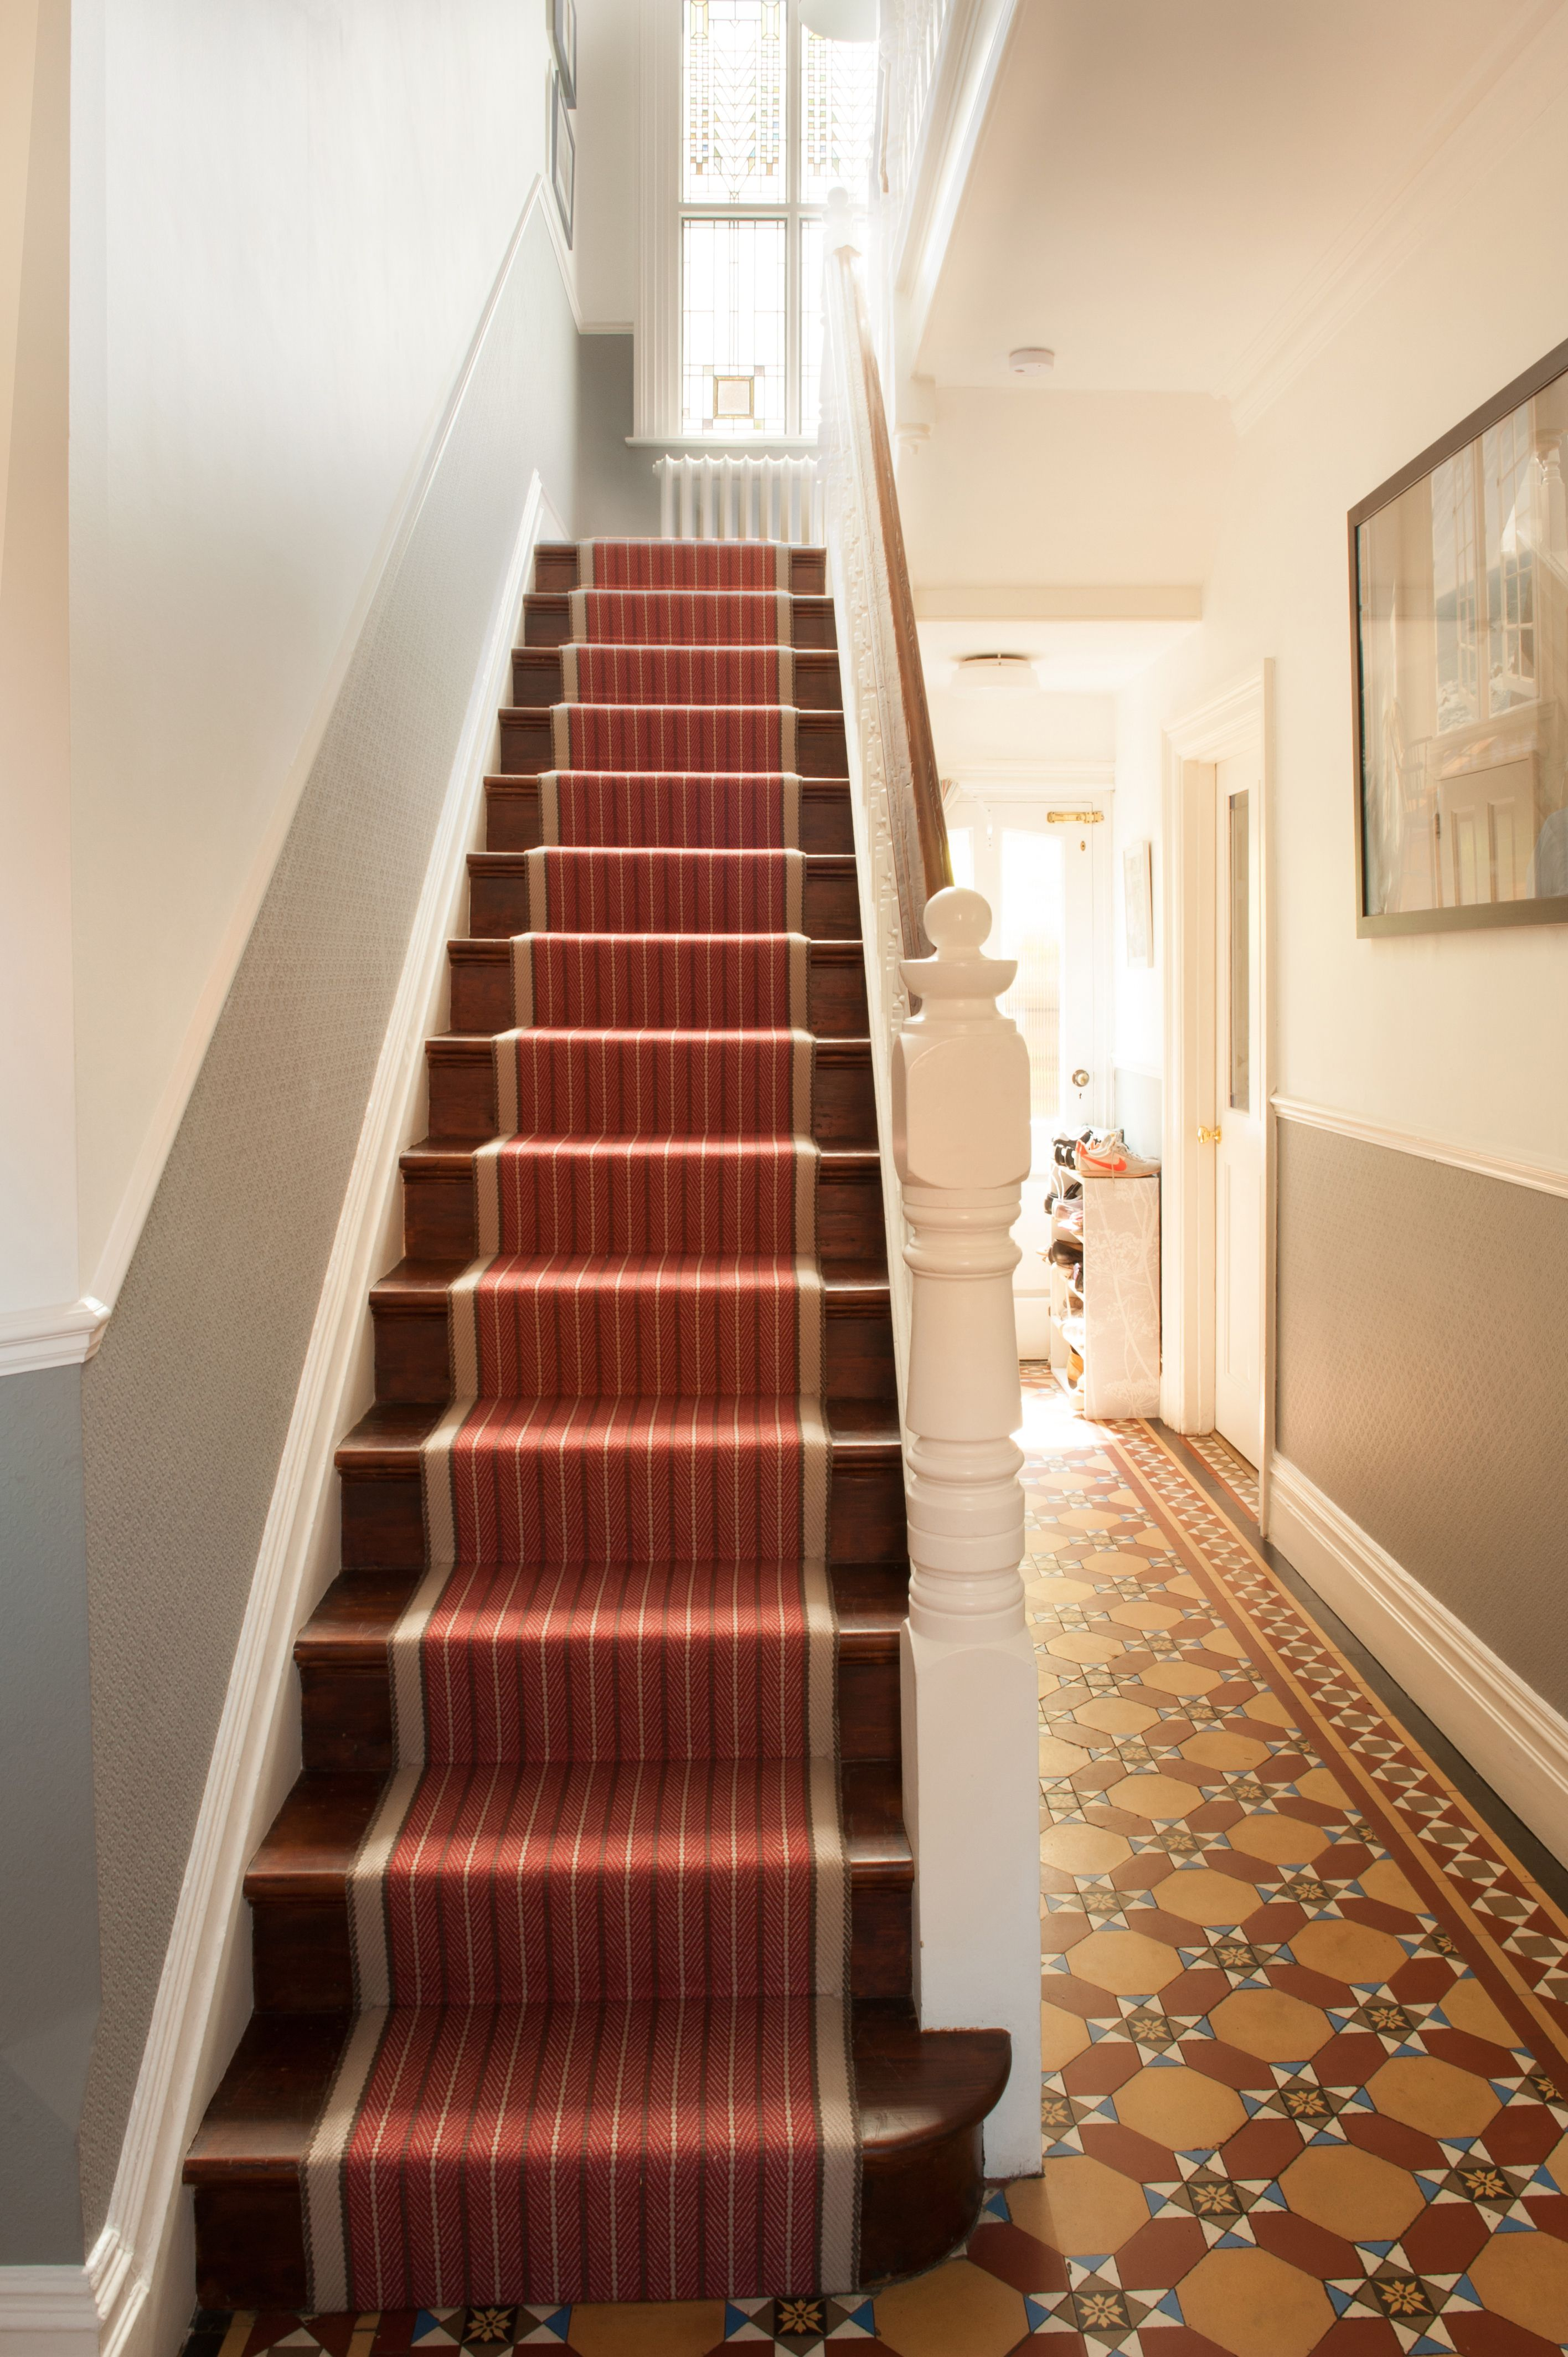 Stair Runner On Walnut Stained Floorboards